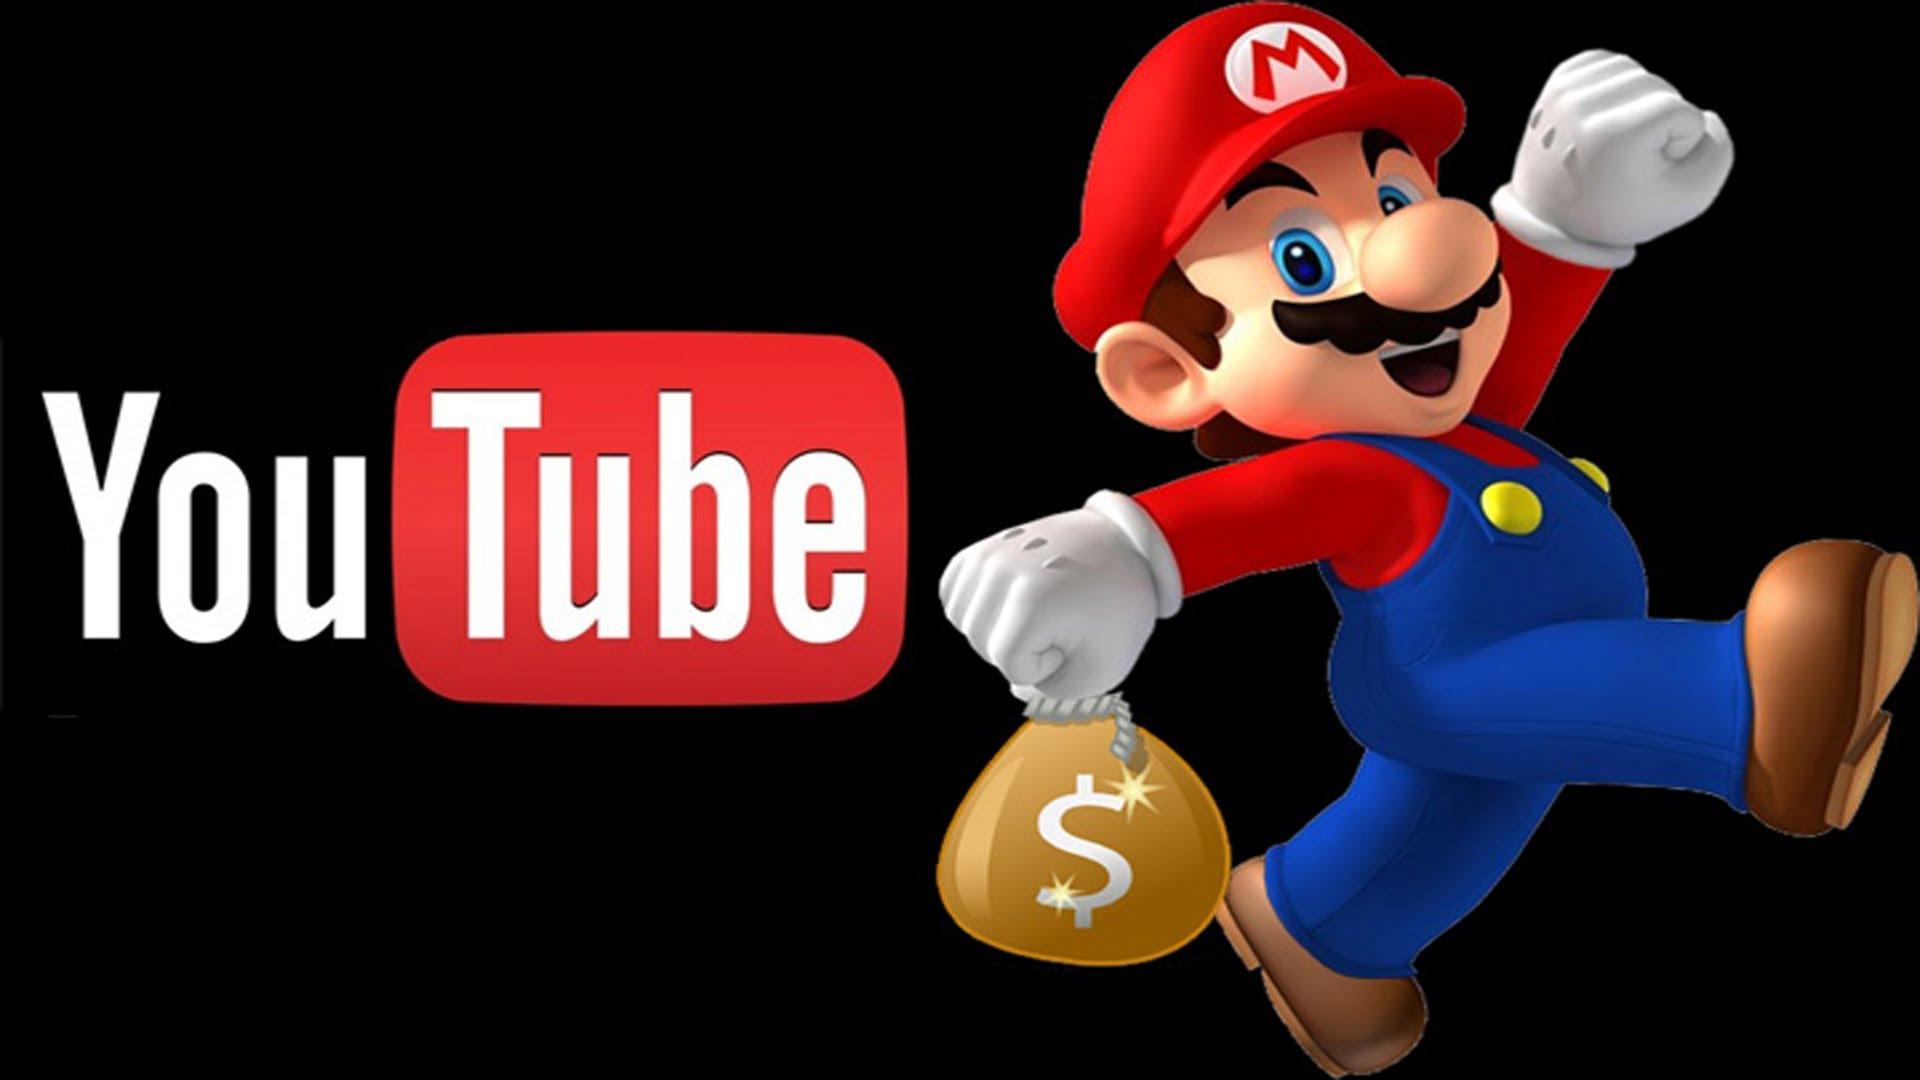 Banni 3 mois de YouTube pour avoir steamé Super Mario Odyssey avant sa sortie